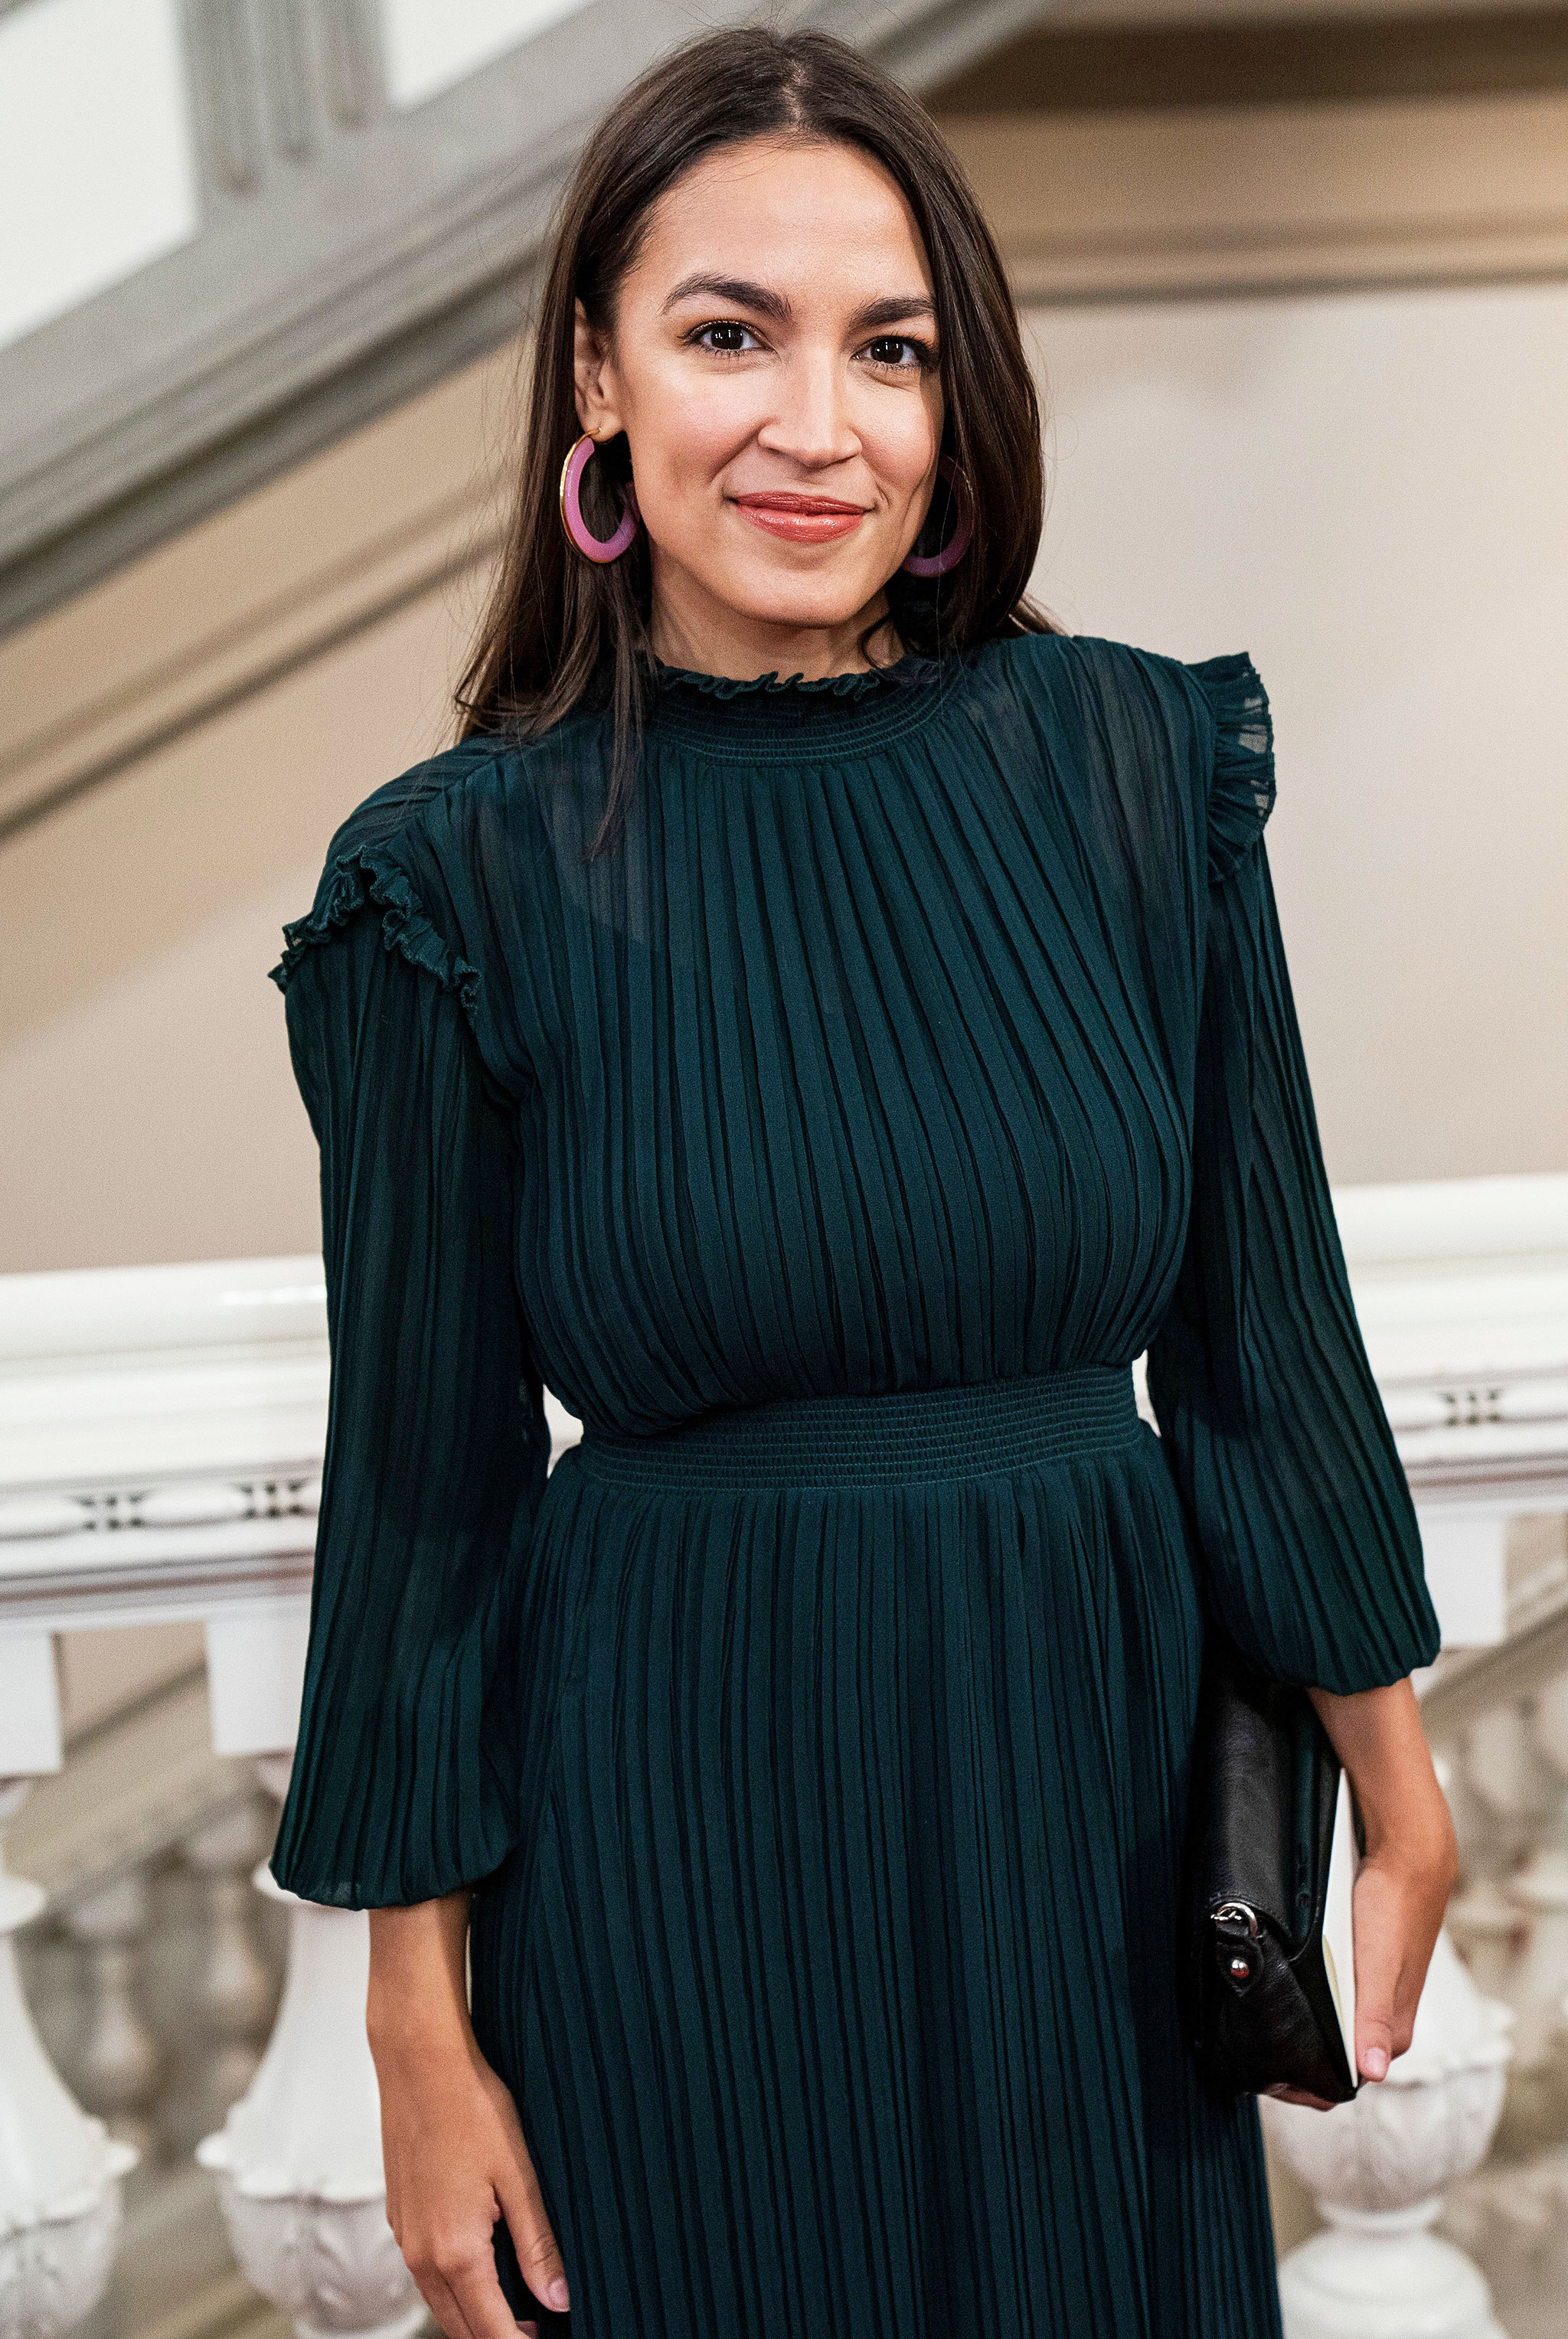 Alexandria Ocasio Cortezs Style Fashion Evolution